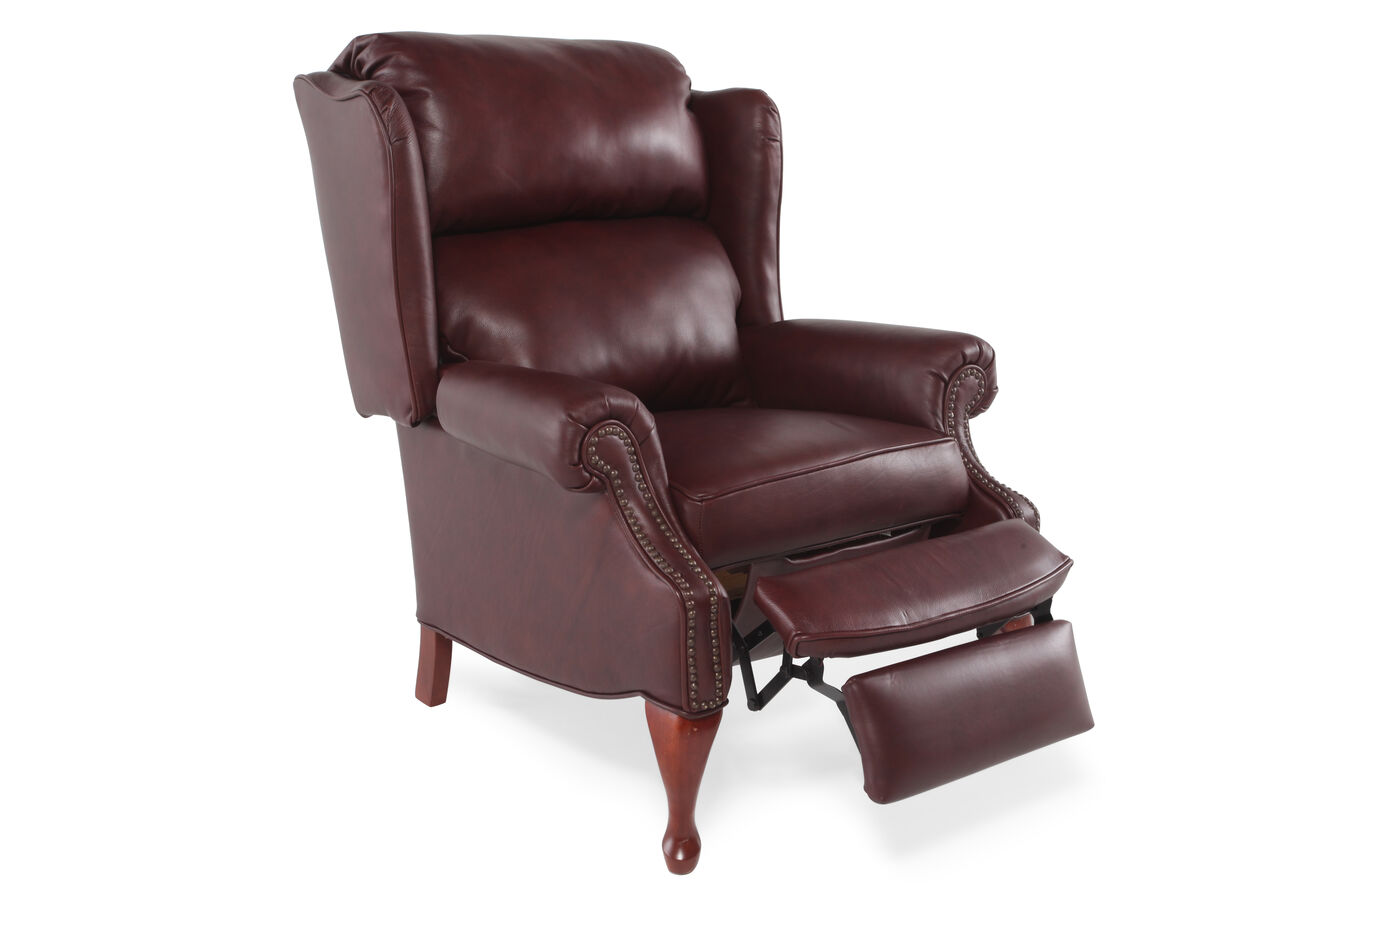 Lane Savannah Leather Recliner Mathis Brothers Furniture